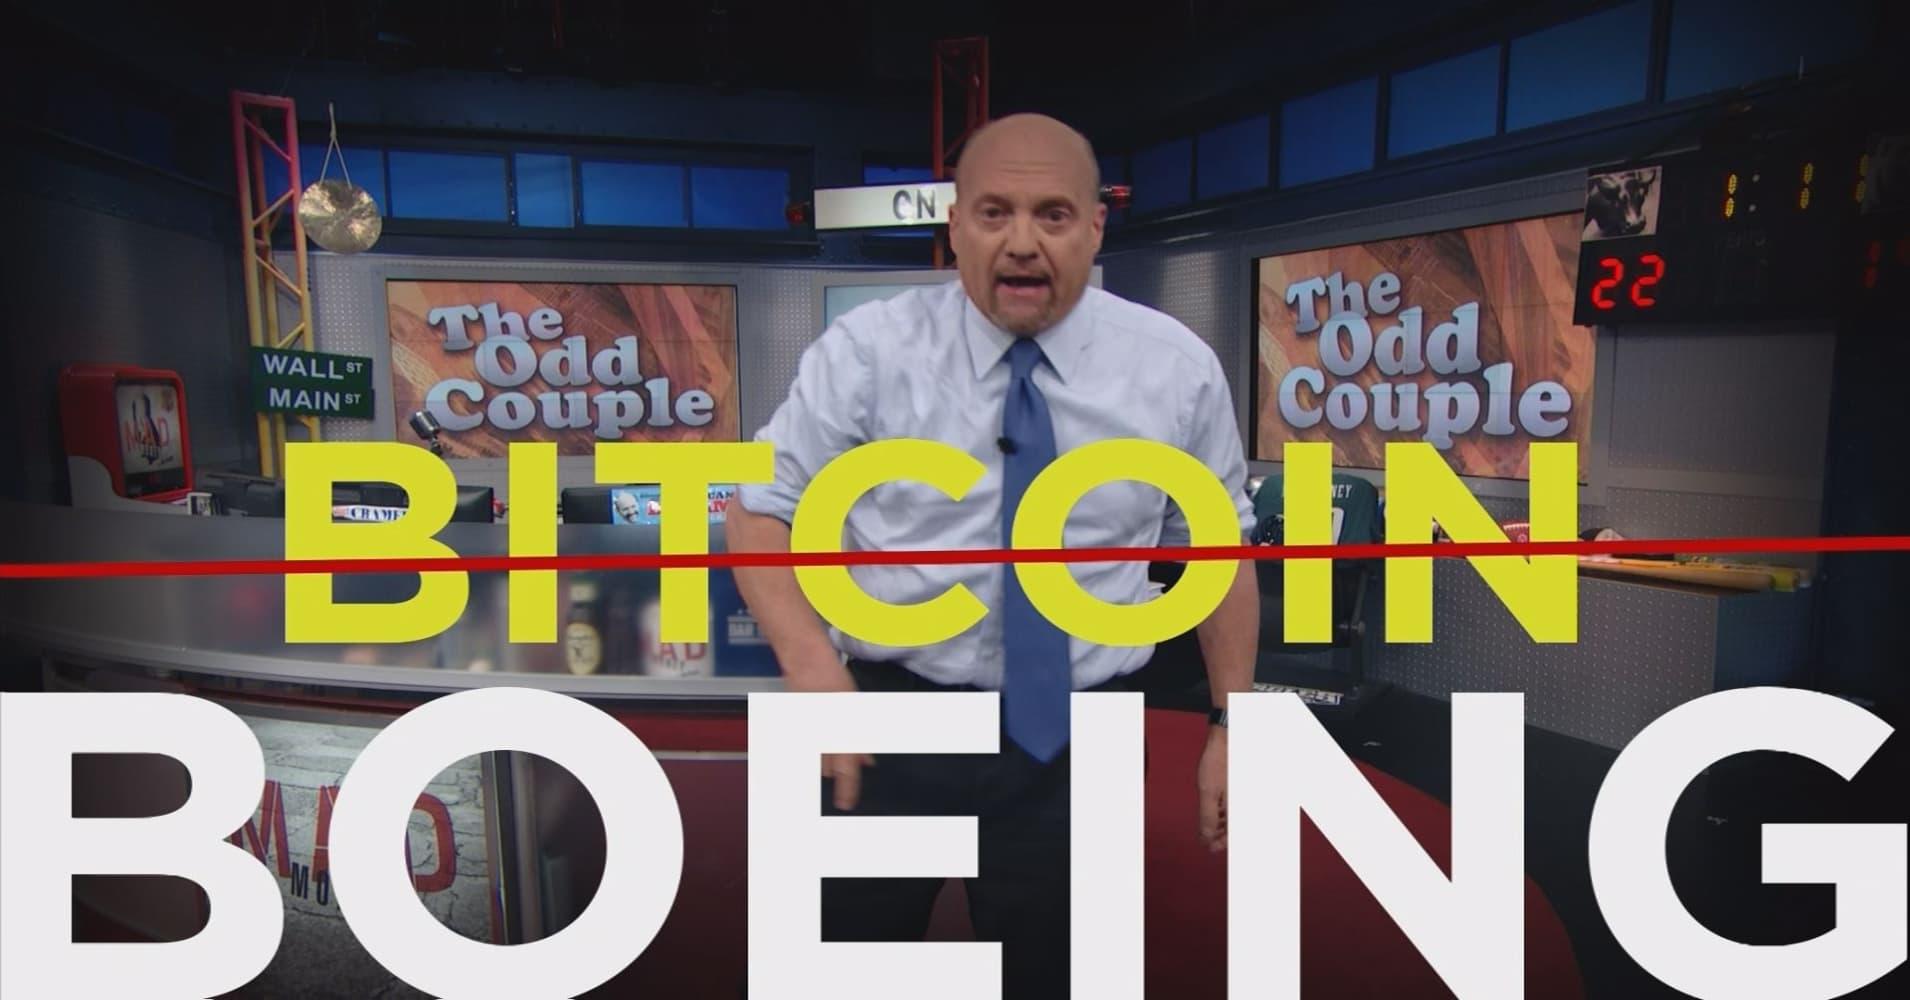 Cramer Remix: Why Boeing is a better bet than bitcoin